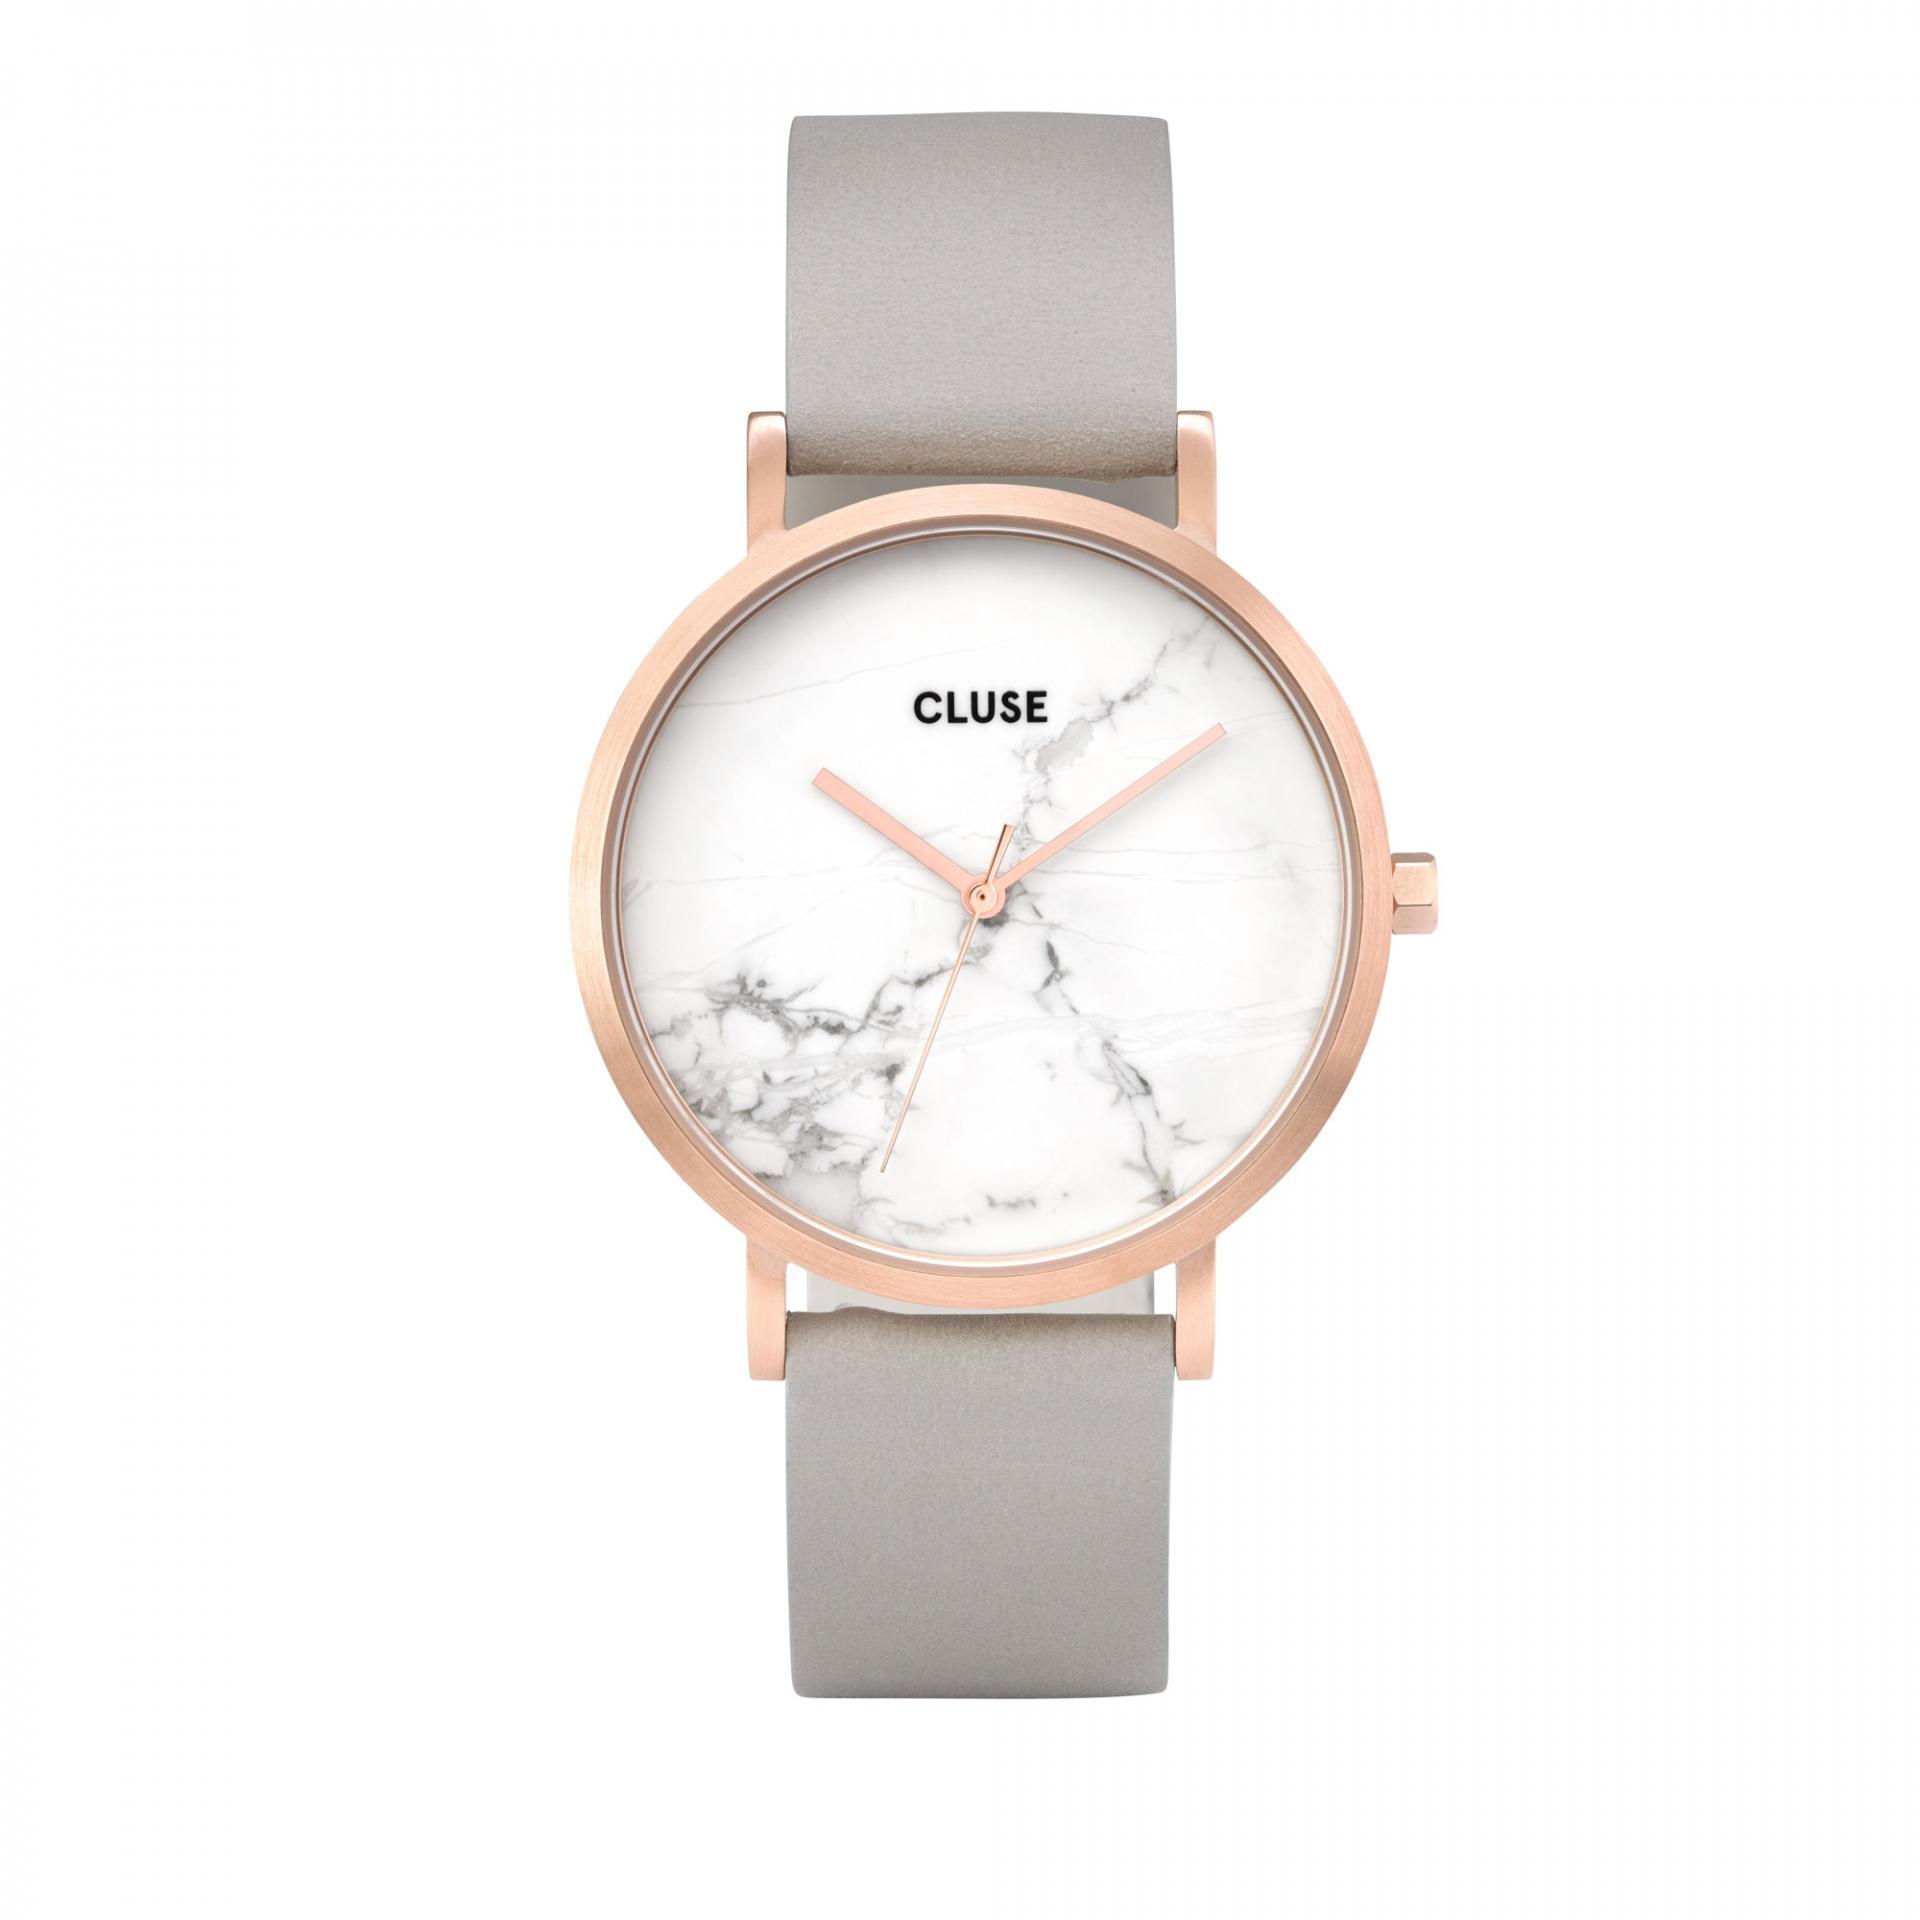 CLUSE Hodinky Cluse La Roche Rose gold White marble/Grey, šedá barva, bílá barva, měděná barva, sklo, kov, kůže, mramor